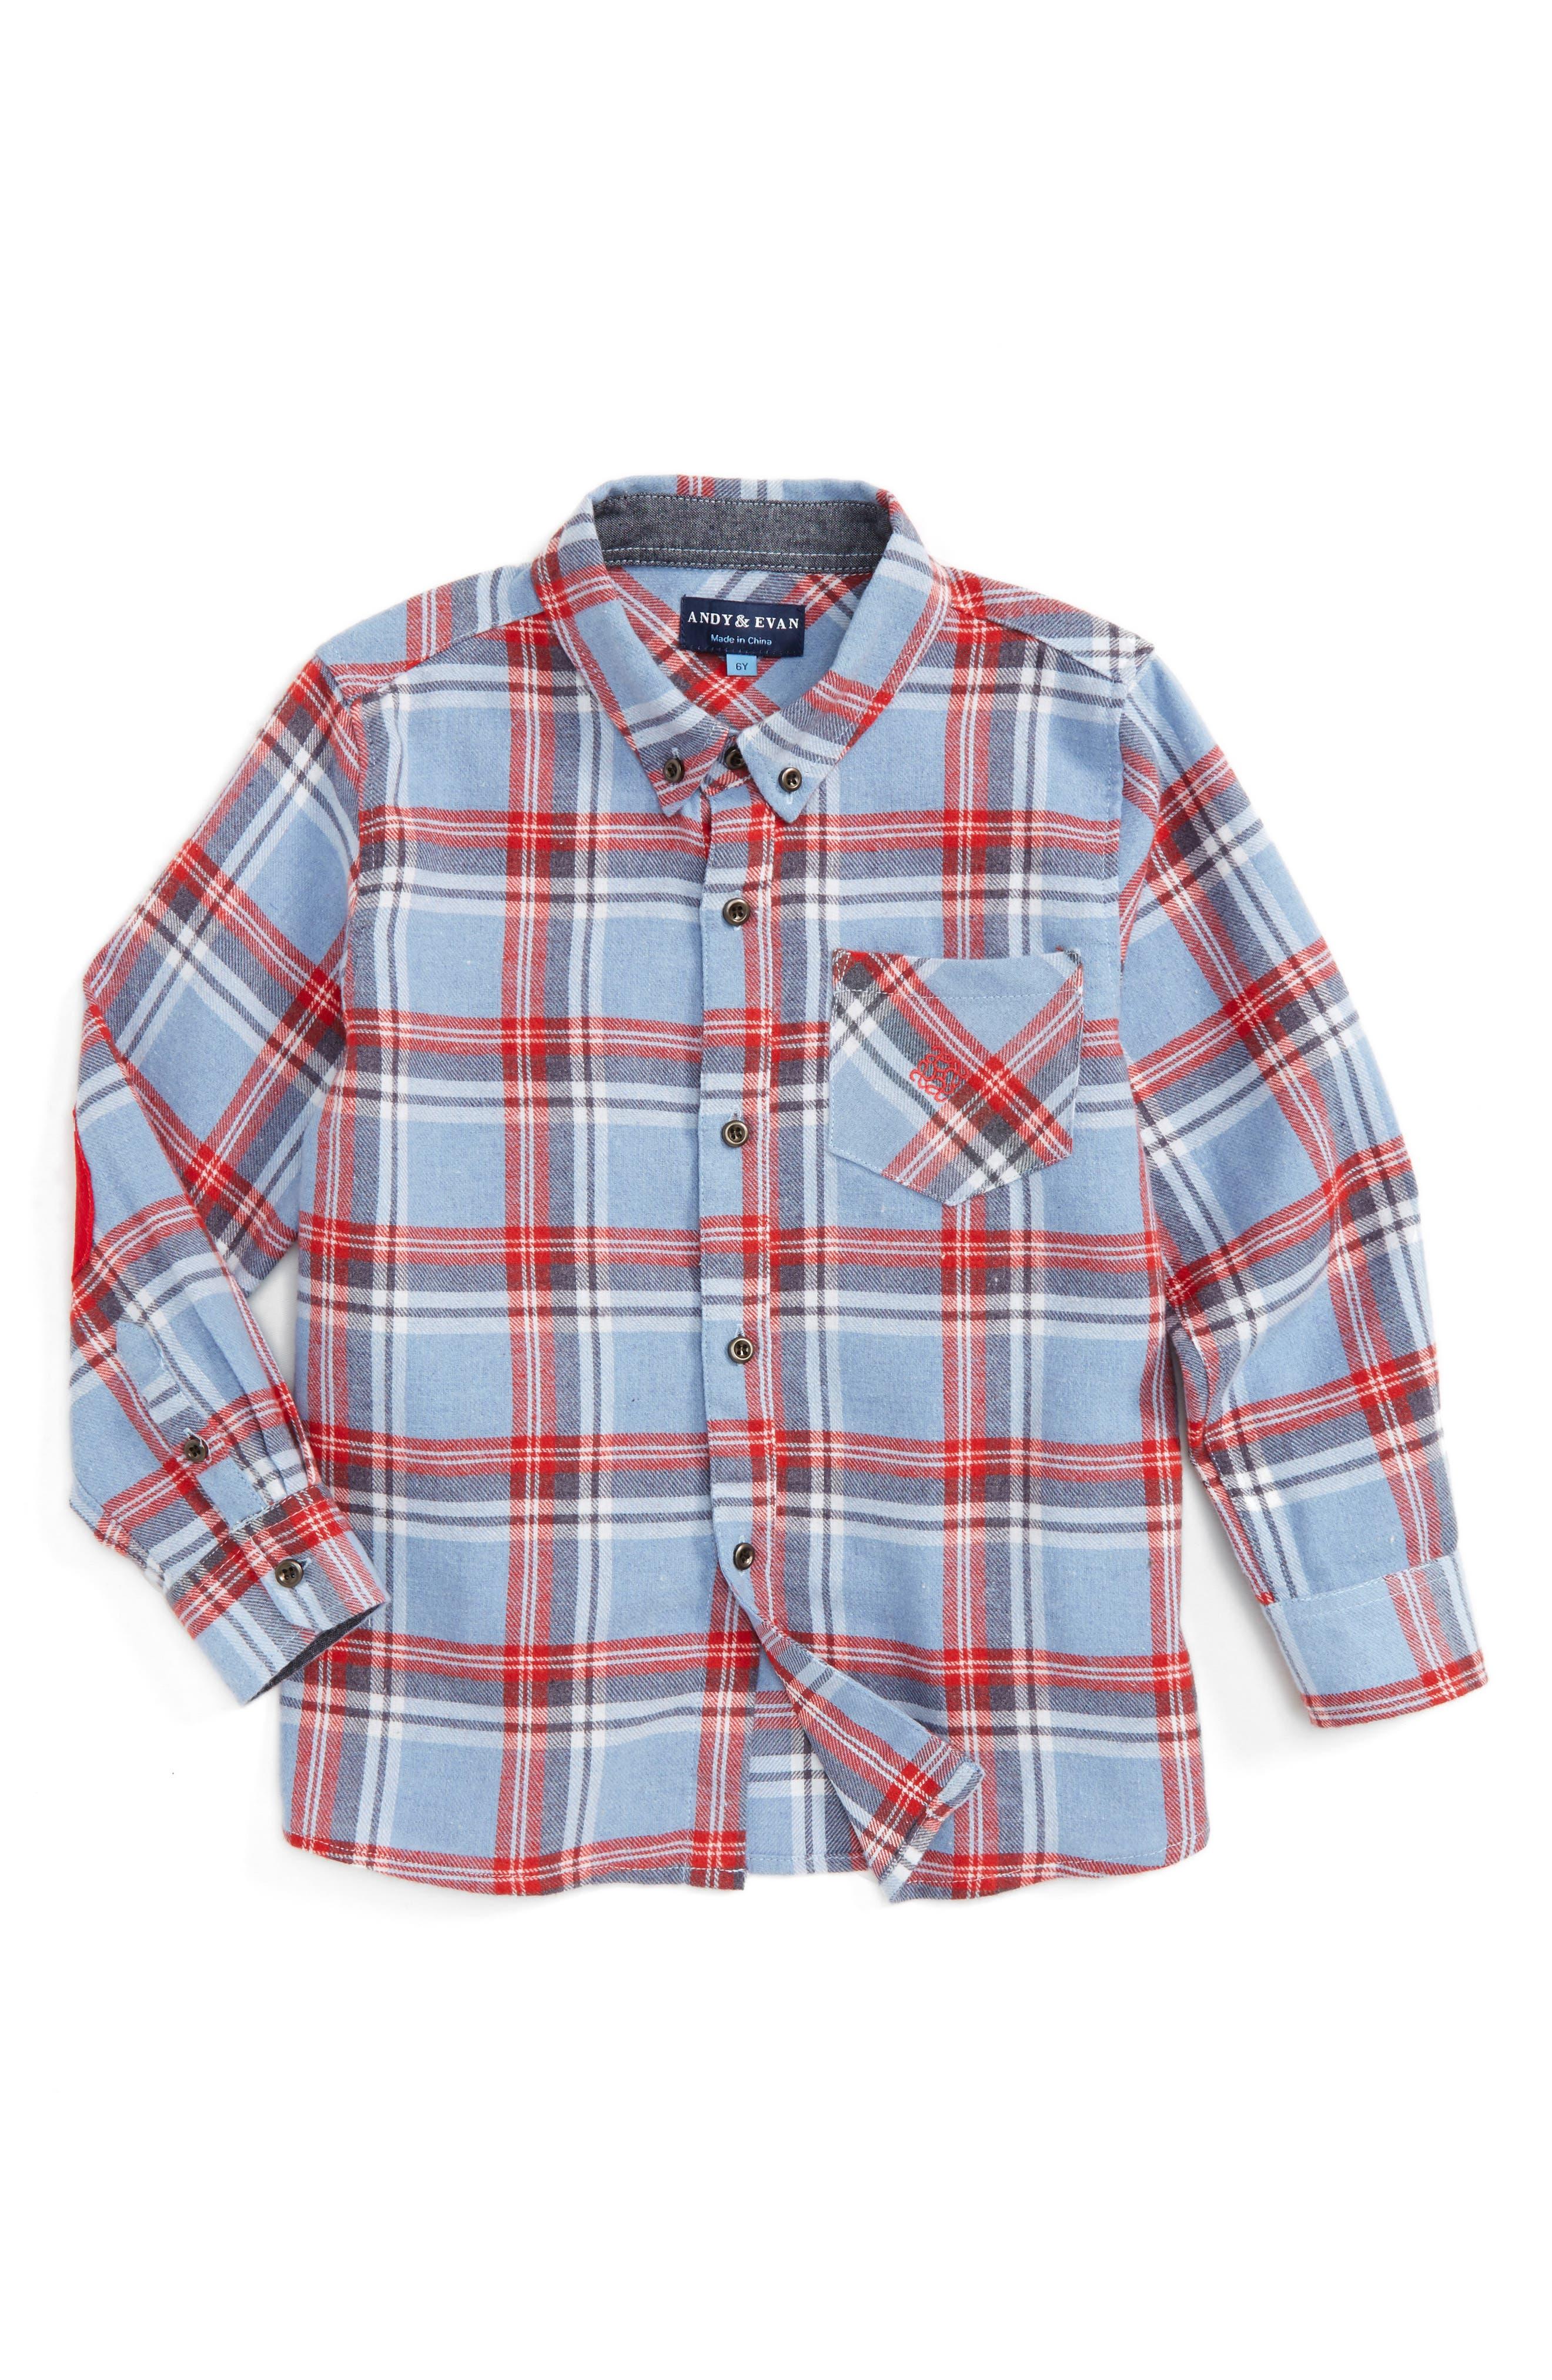 Alternate Image 1 Selected - Andy & Evan Plaid Flannel Shirt (Toddler Boys & Little Boys)